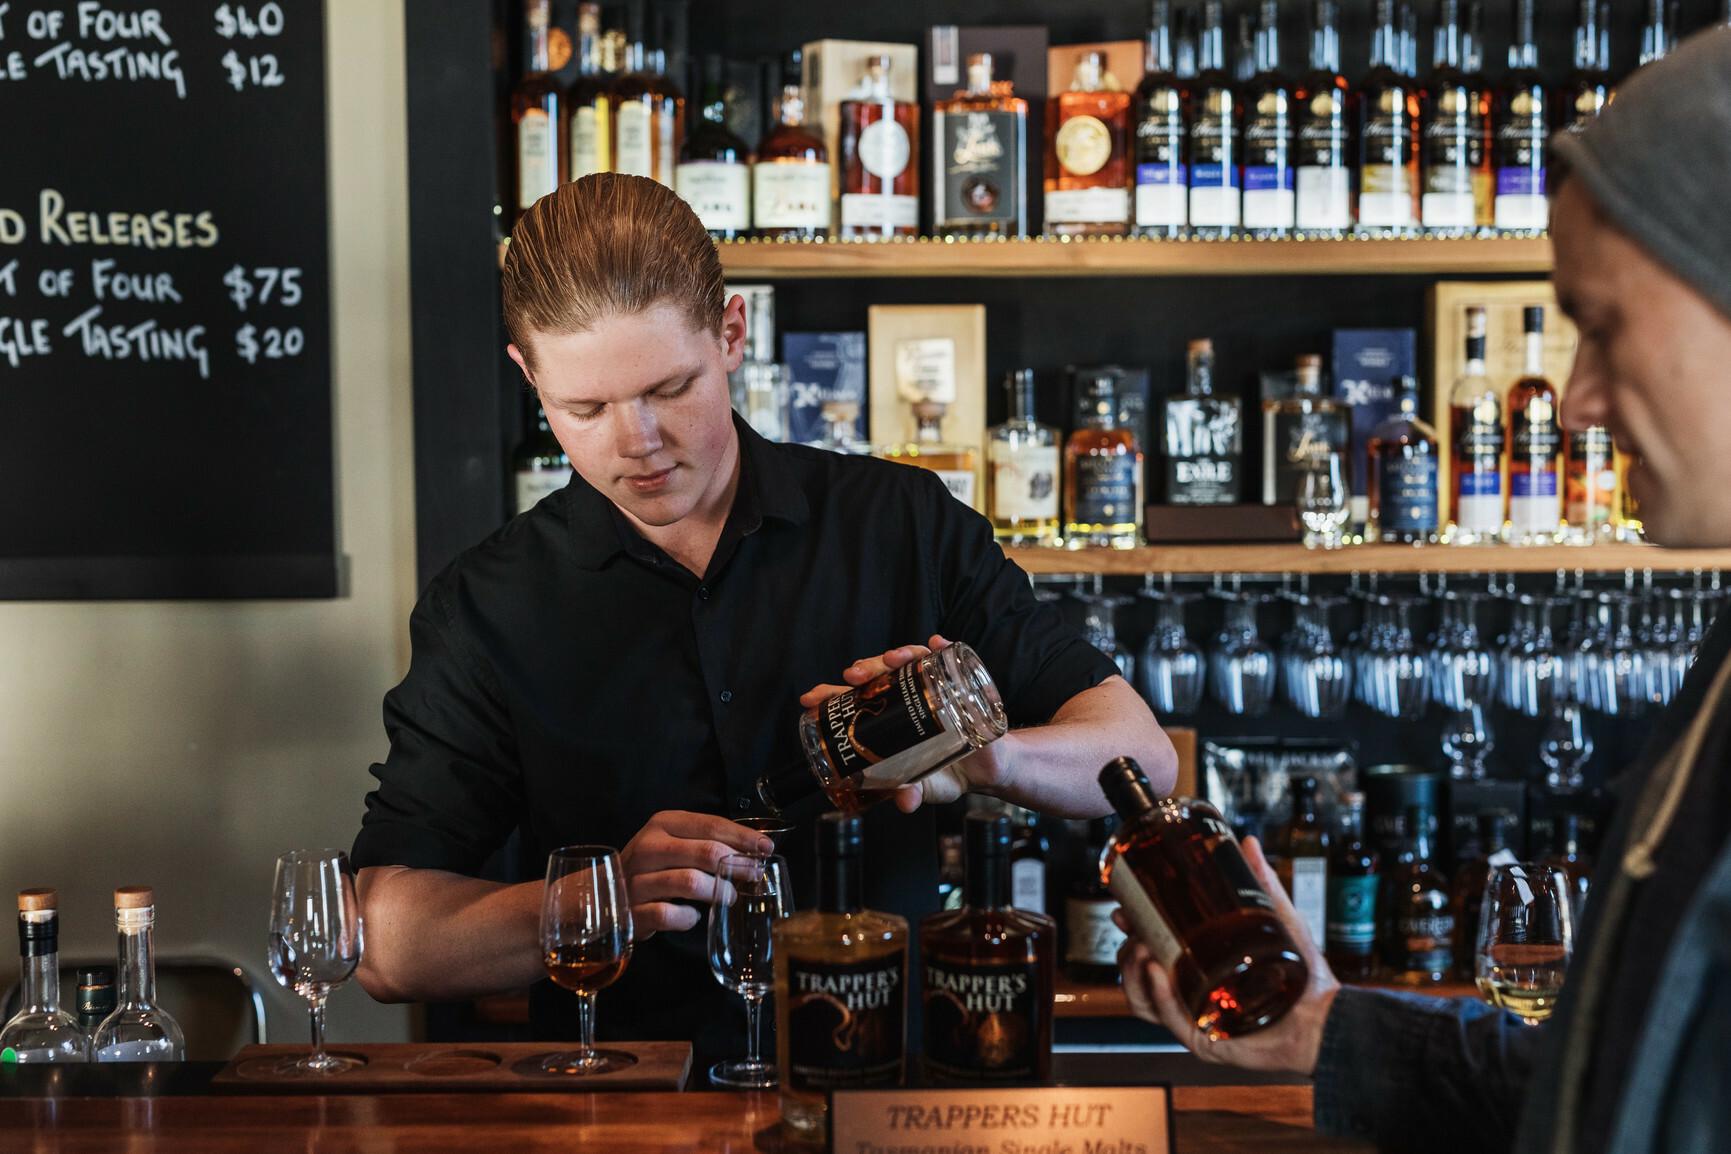 Bruny whisky